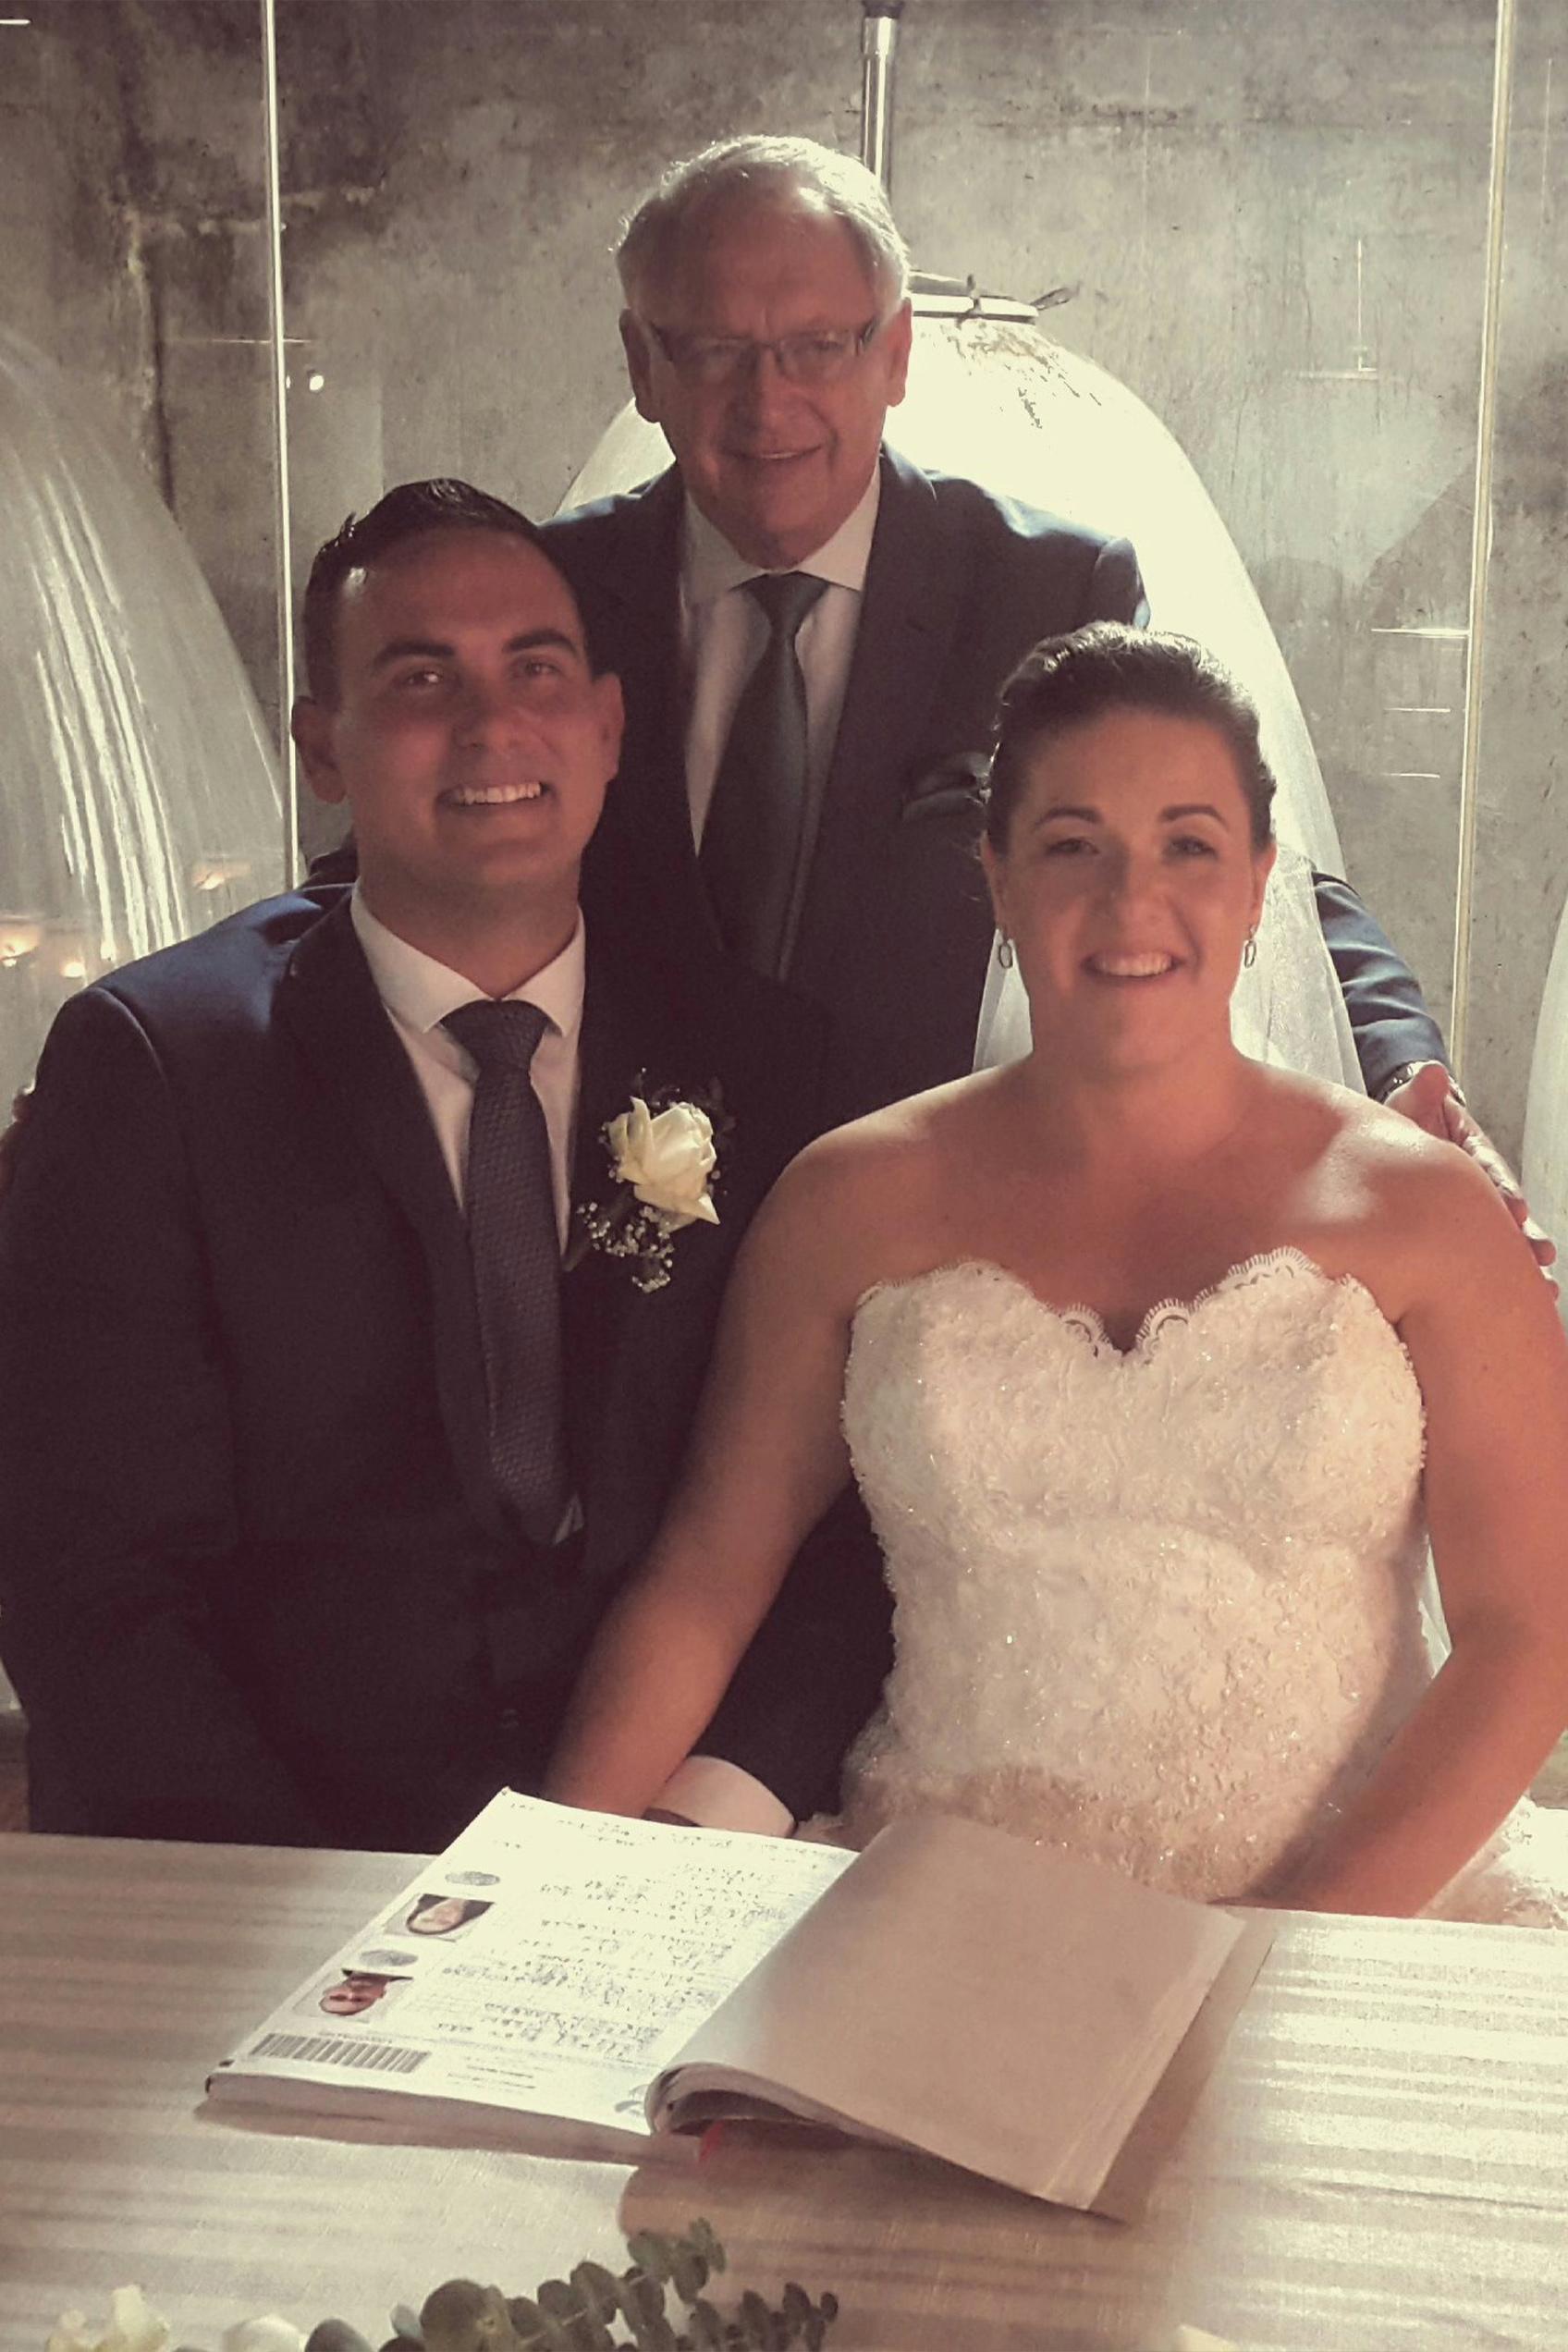 Fairest Cape Weddings - Marriage Officers Cape Town